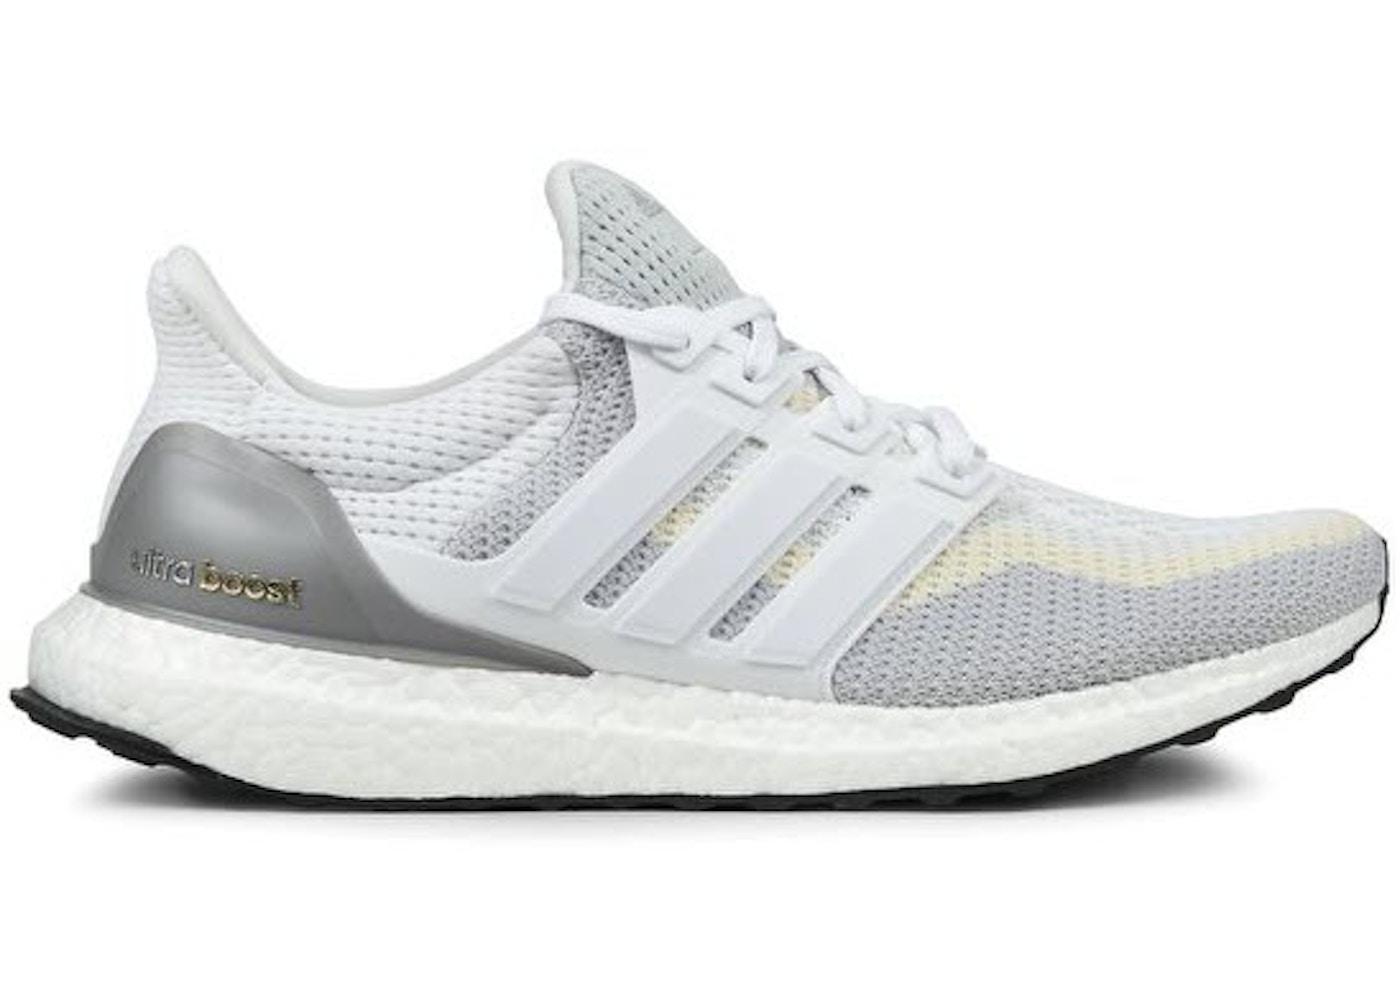 286daae15 adidas Ultra Boost Size 14 Shoes - Price Premium